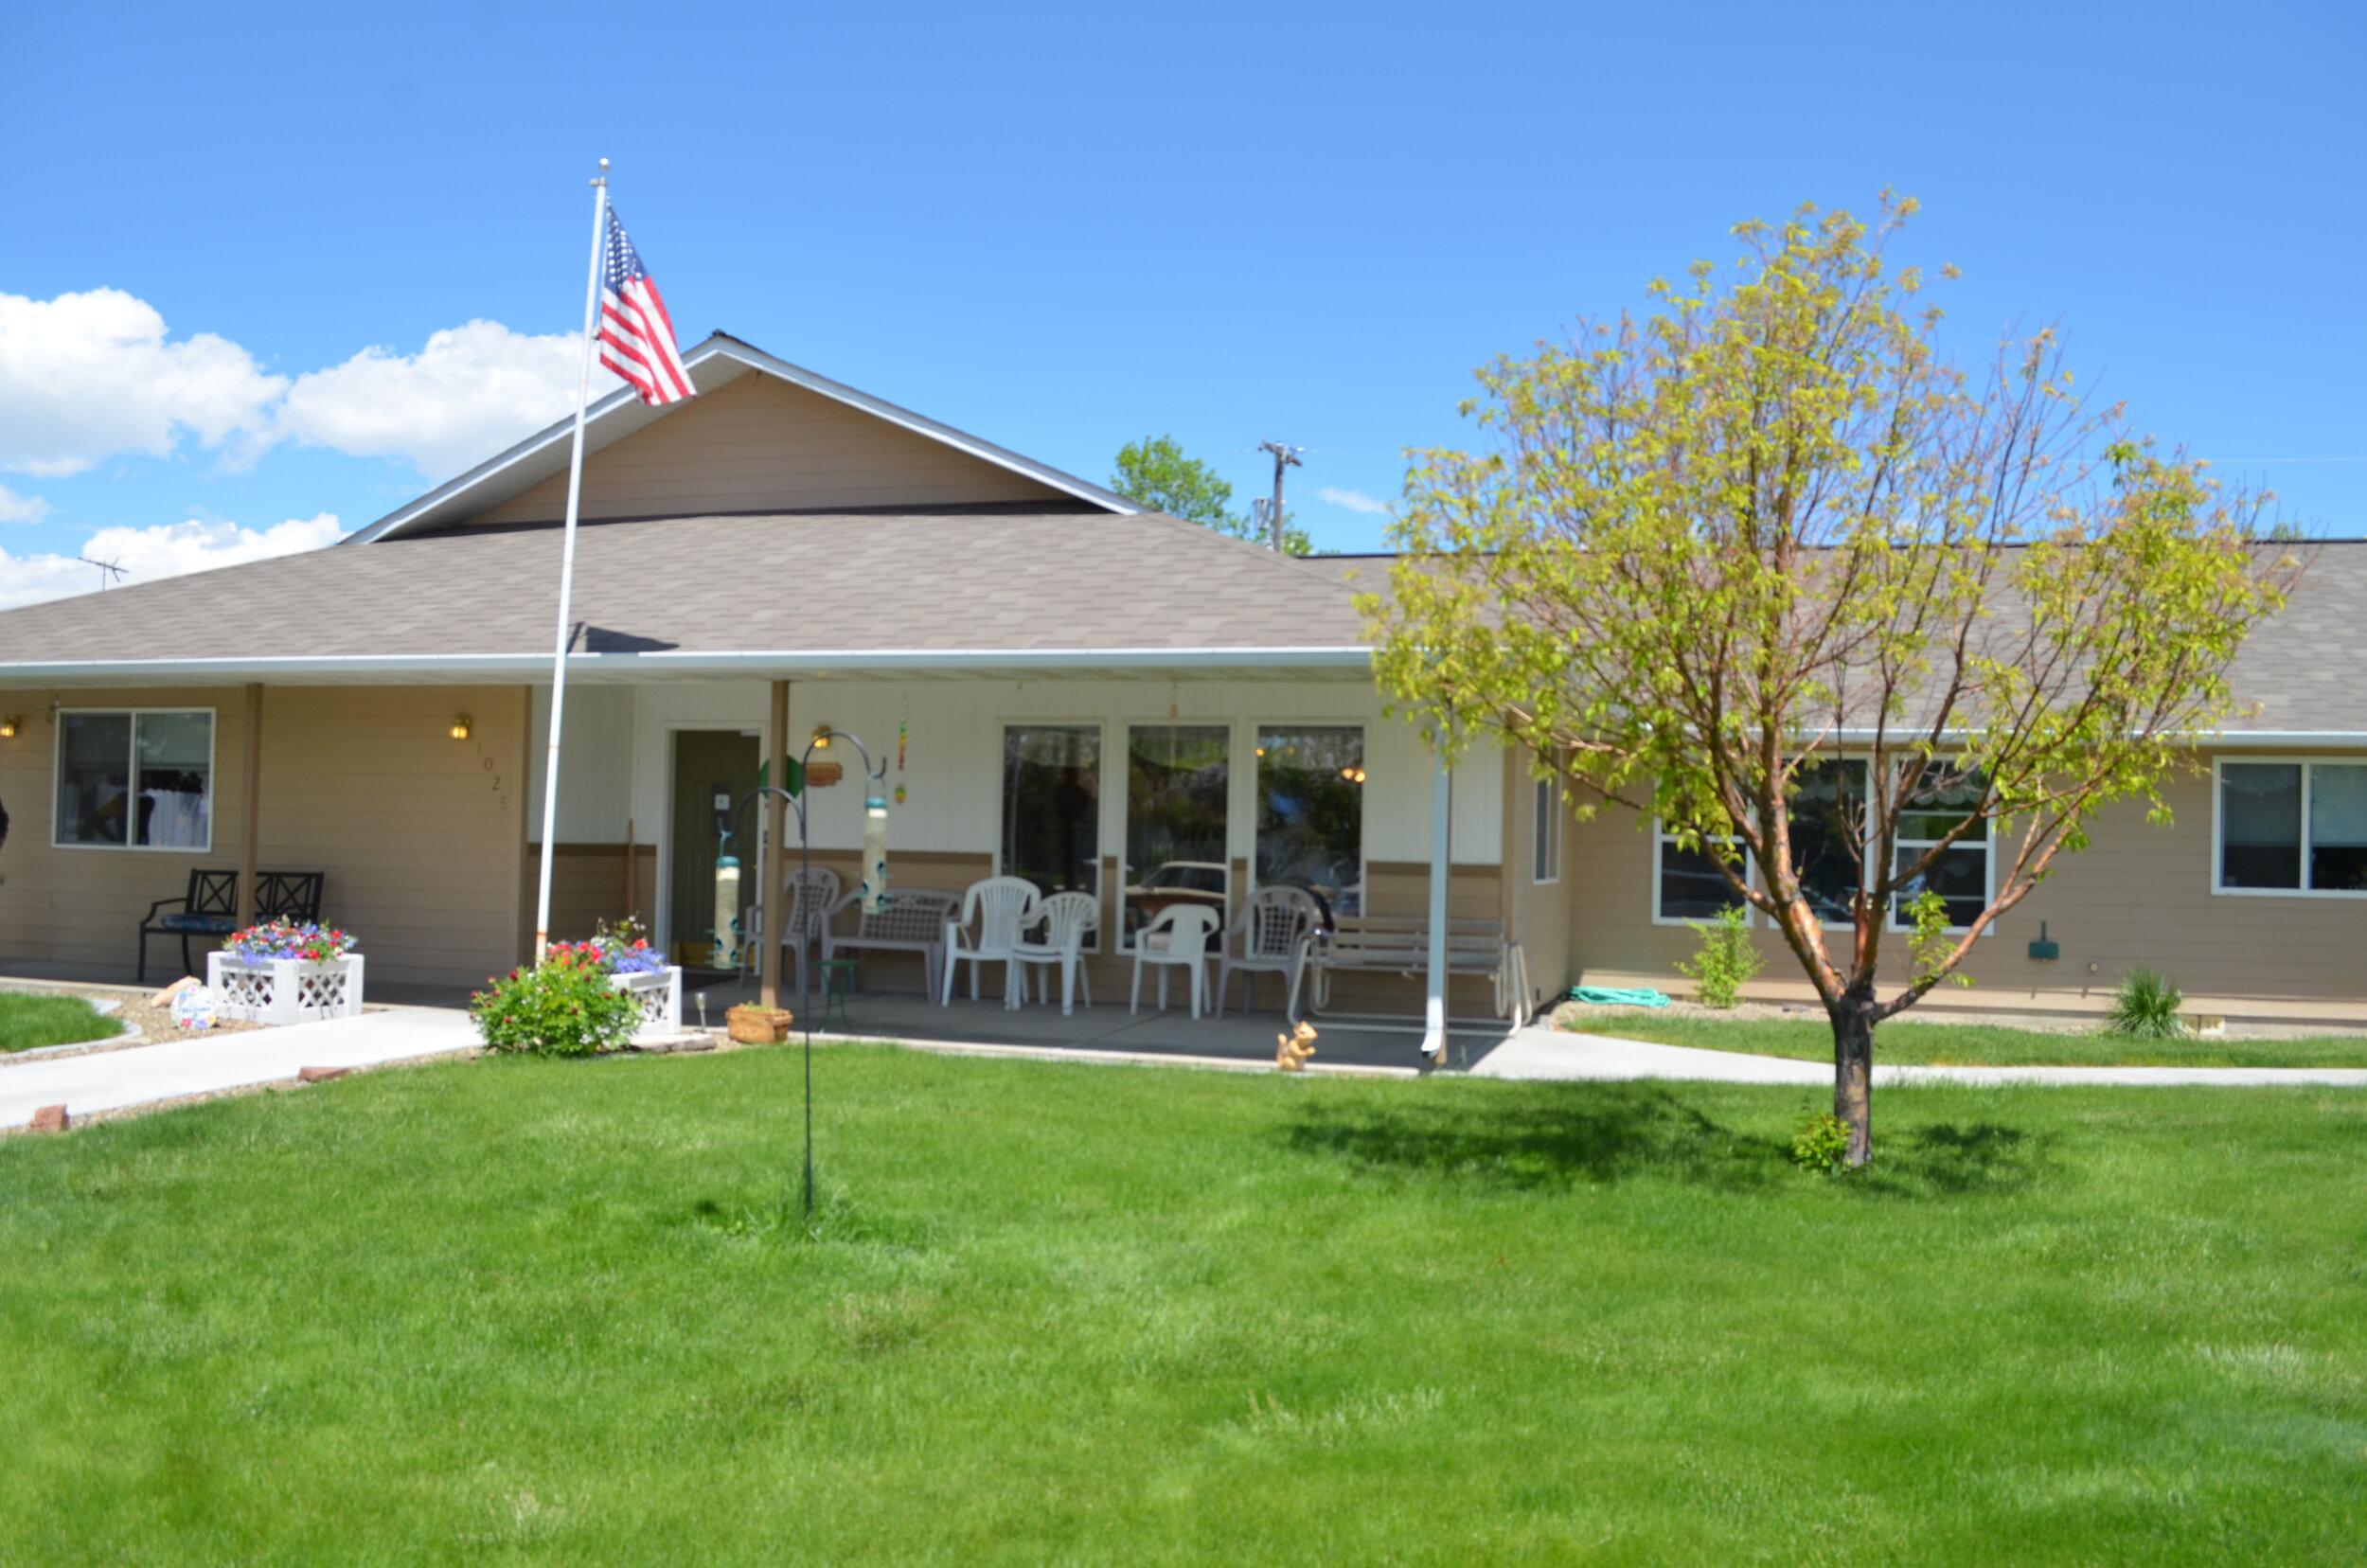 1025 E. Center St. Dillon, MT 59725